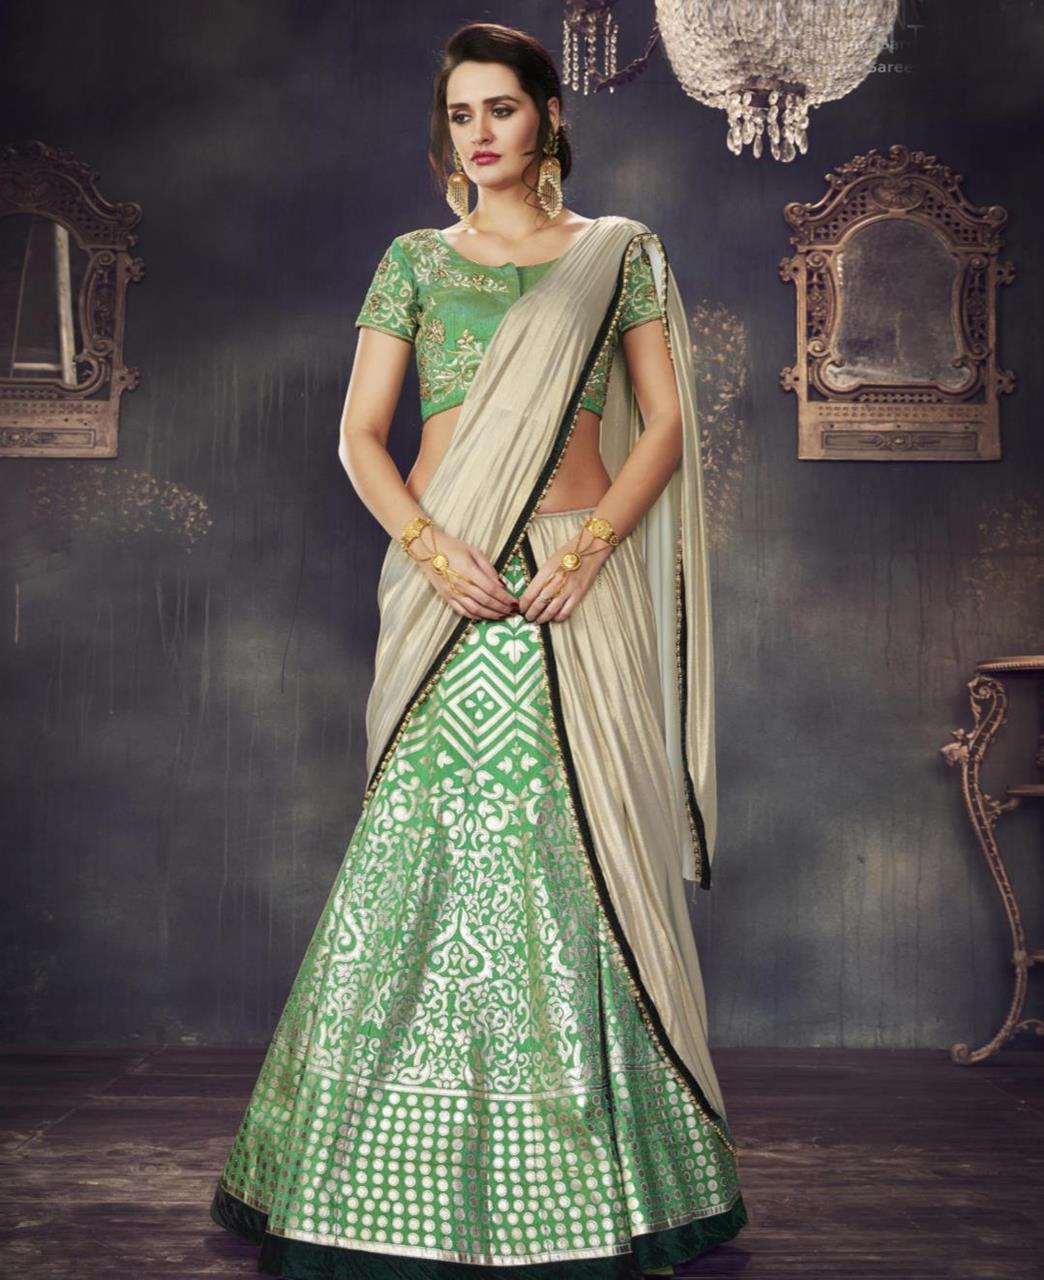 Printed Dupion Silk Green Circular Lehenga Choli Ghagra